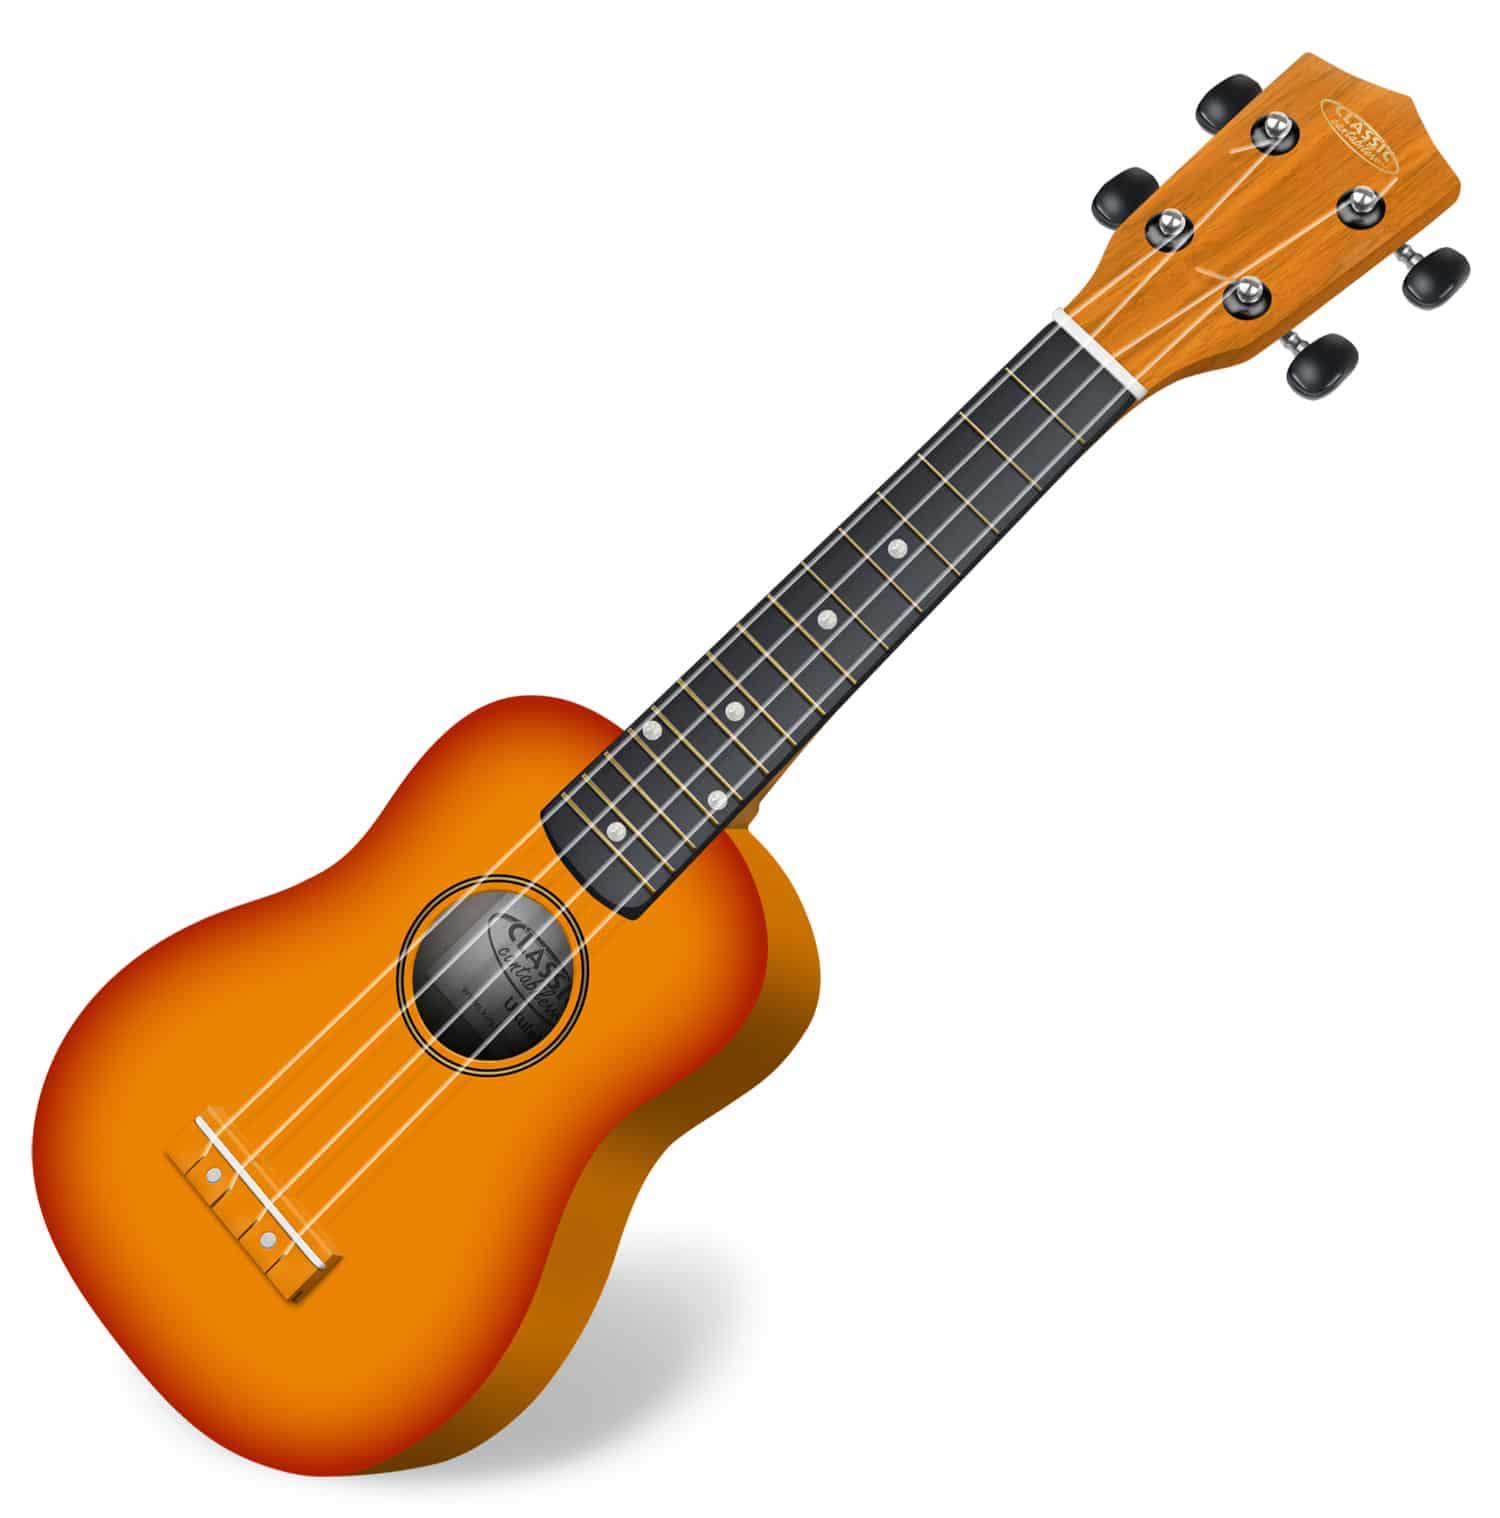 classic cantabile us 100 ukelele madera hawaii guitarra. Black Bedroom Furniture Sets. Home Design Ideas